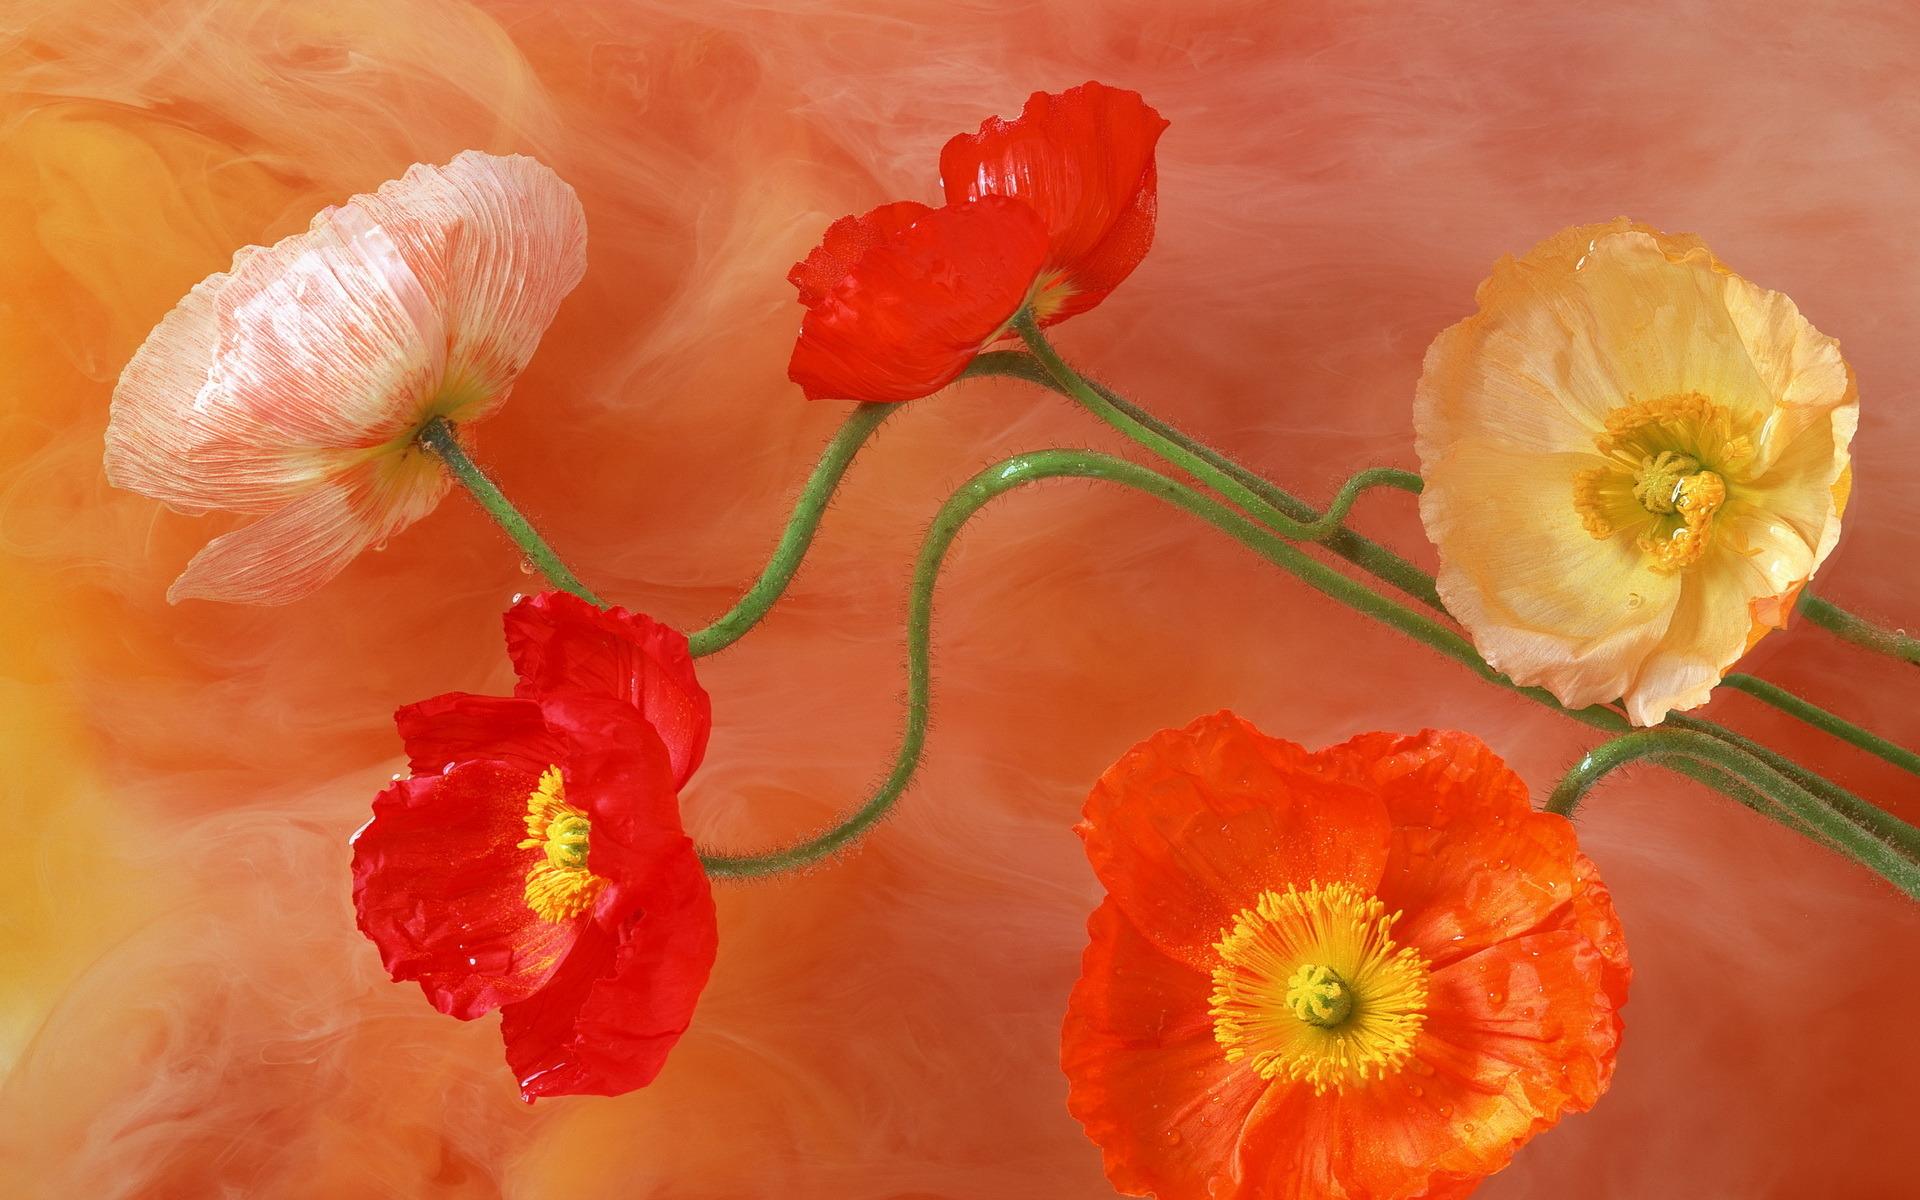 Flores artificiales - 1920x1200